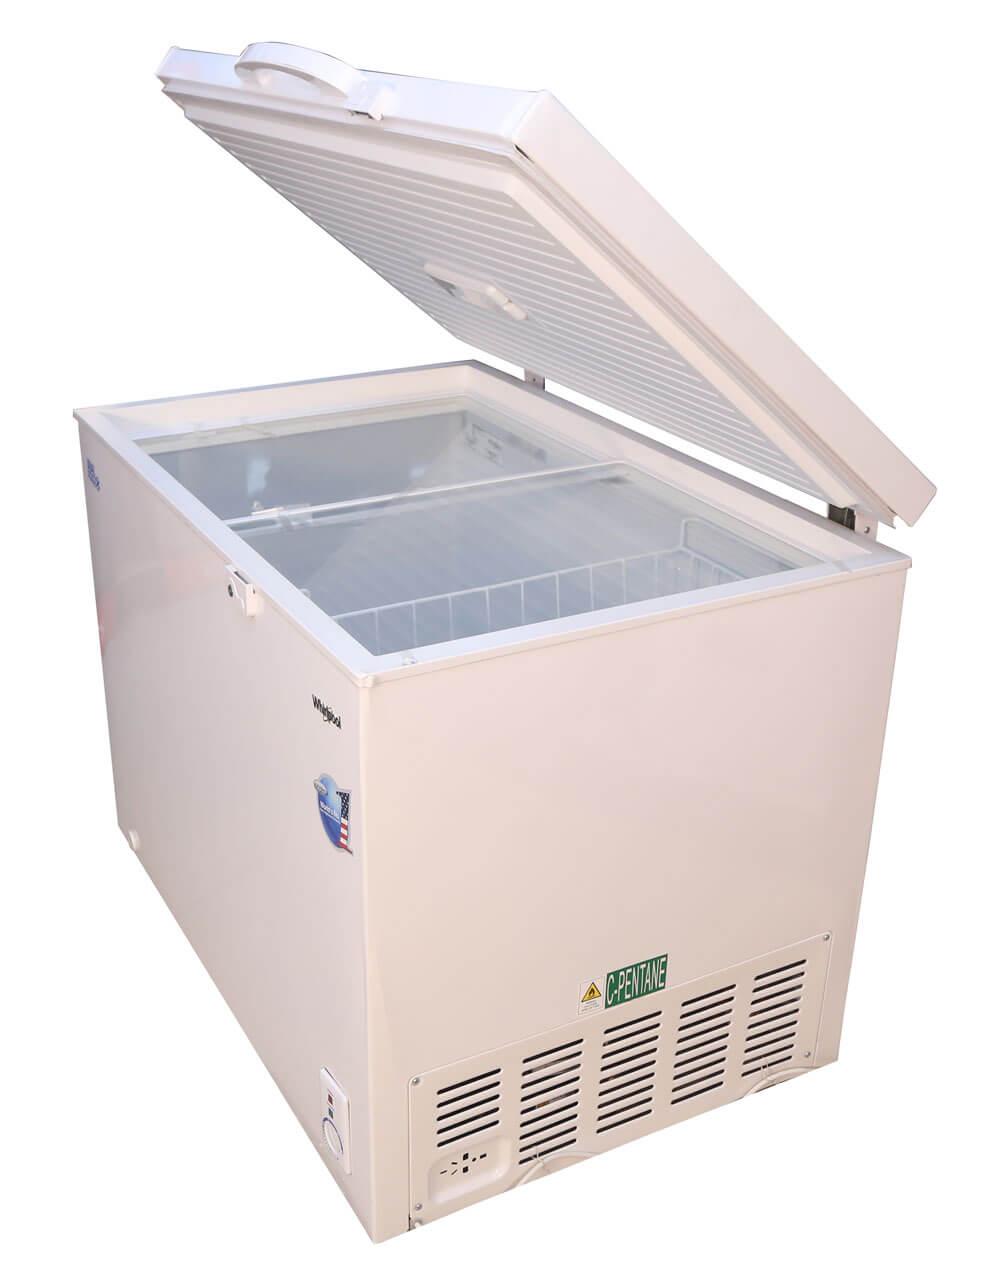 Whirlpool Chest Freezer 200 Ltr - WCF 200